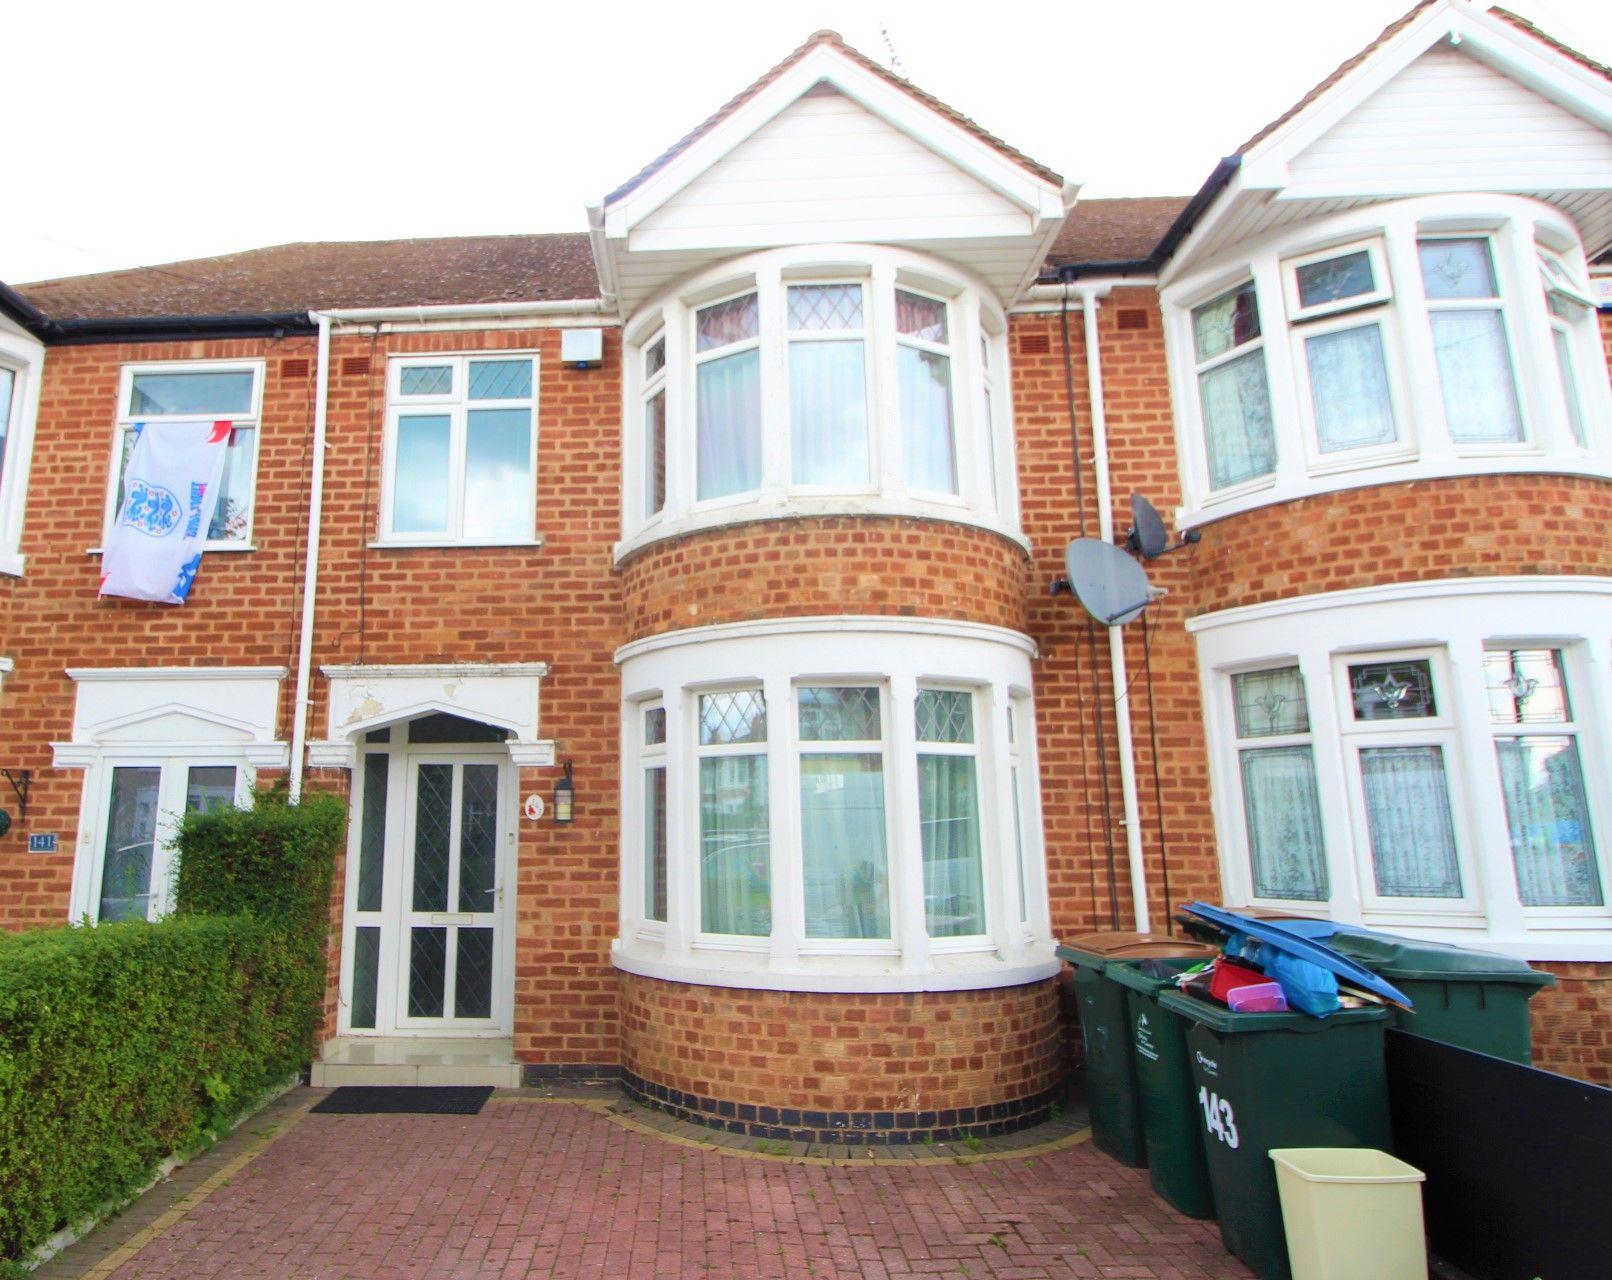 Property photo 1 of 15.